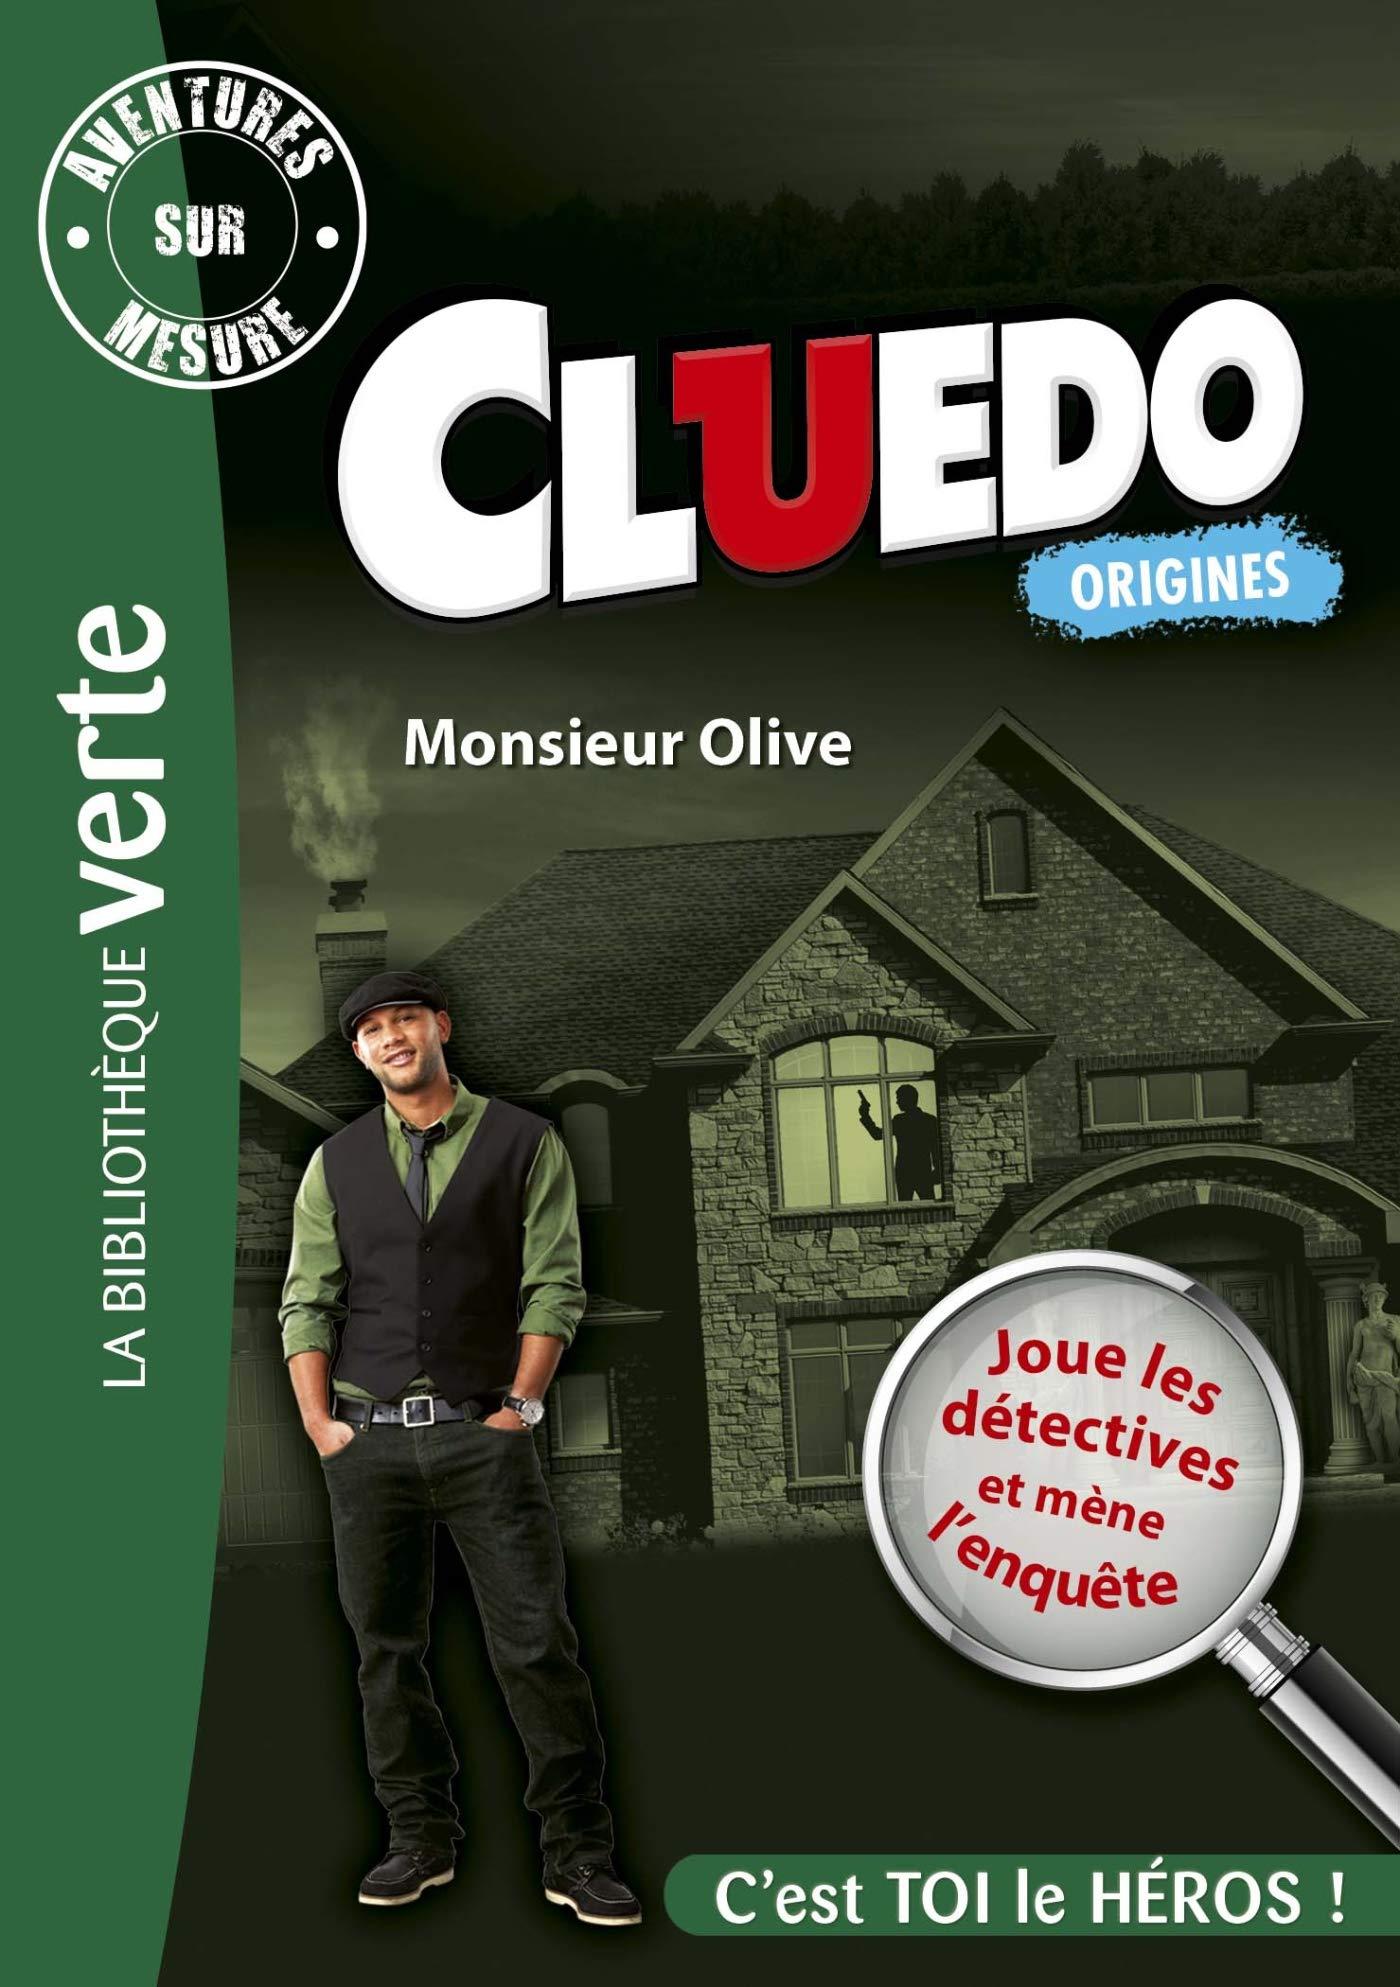 Aventures sur Mesure Cluedo 03 - Monsieur Olive Bibliothèque Verte Plus: Amazon.es: Hasbro: Libros en idiomas extranjeros